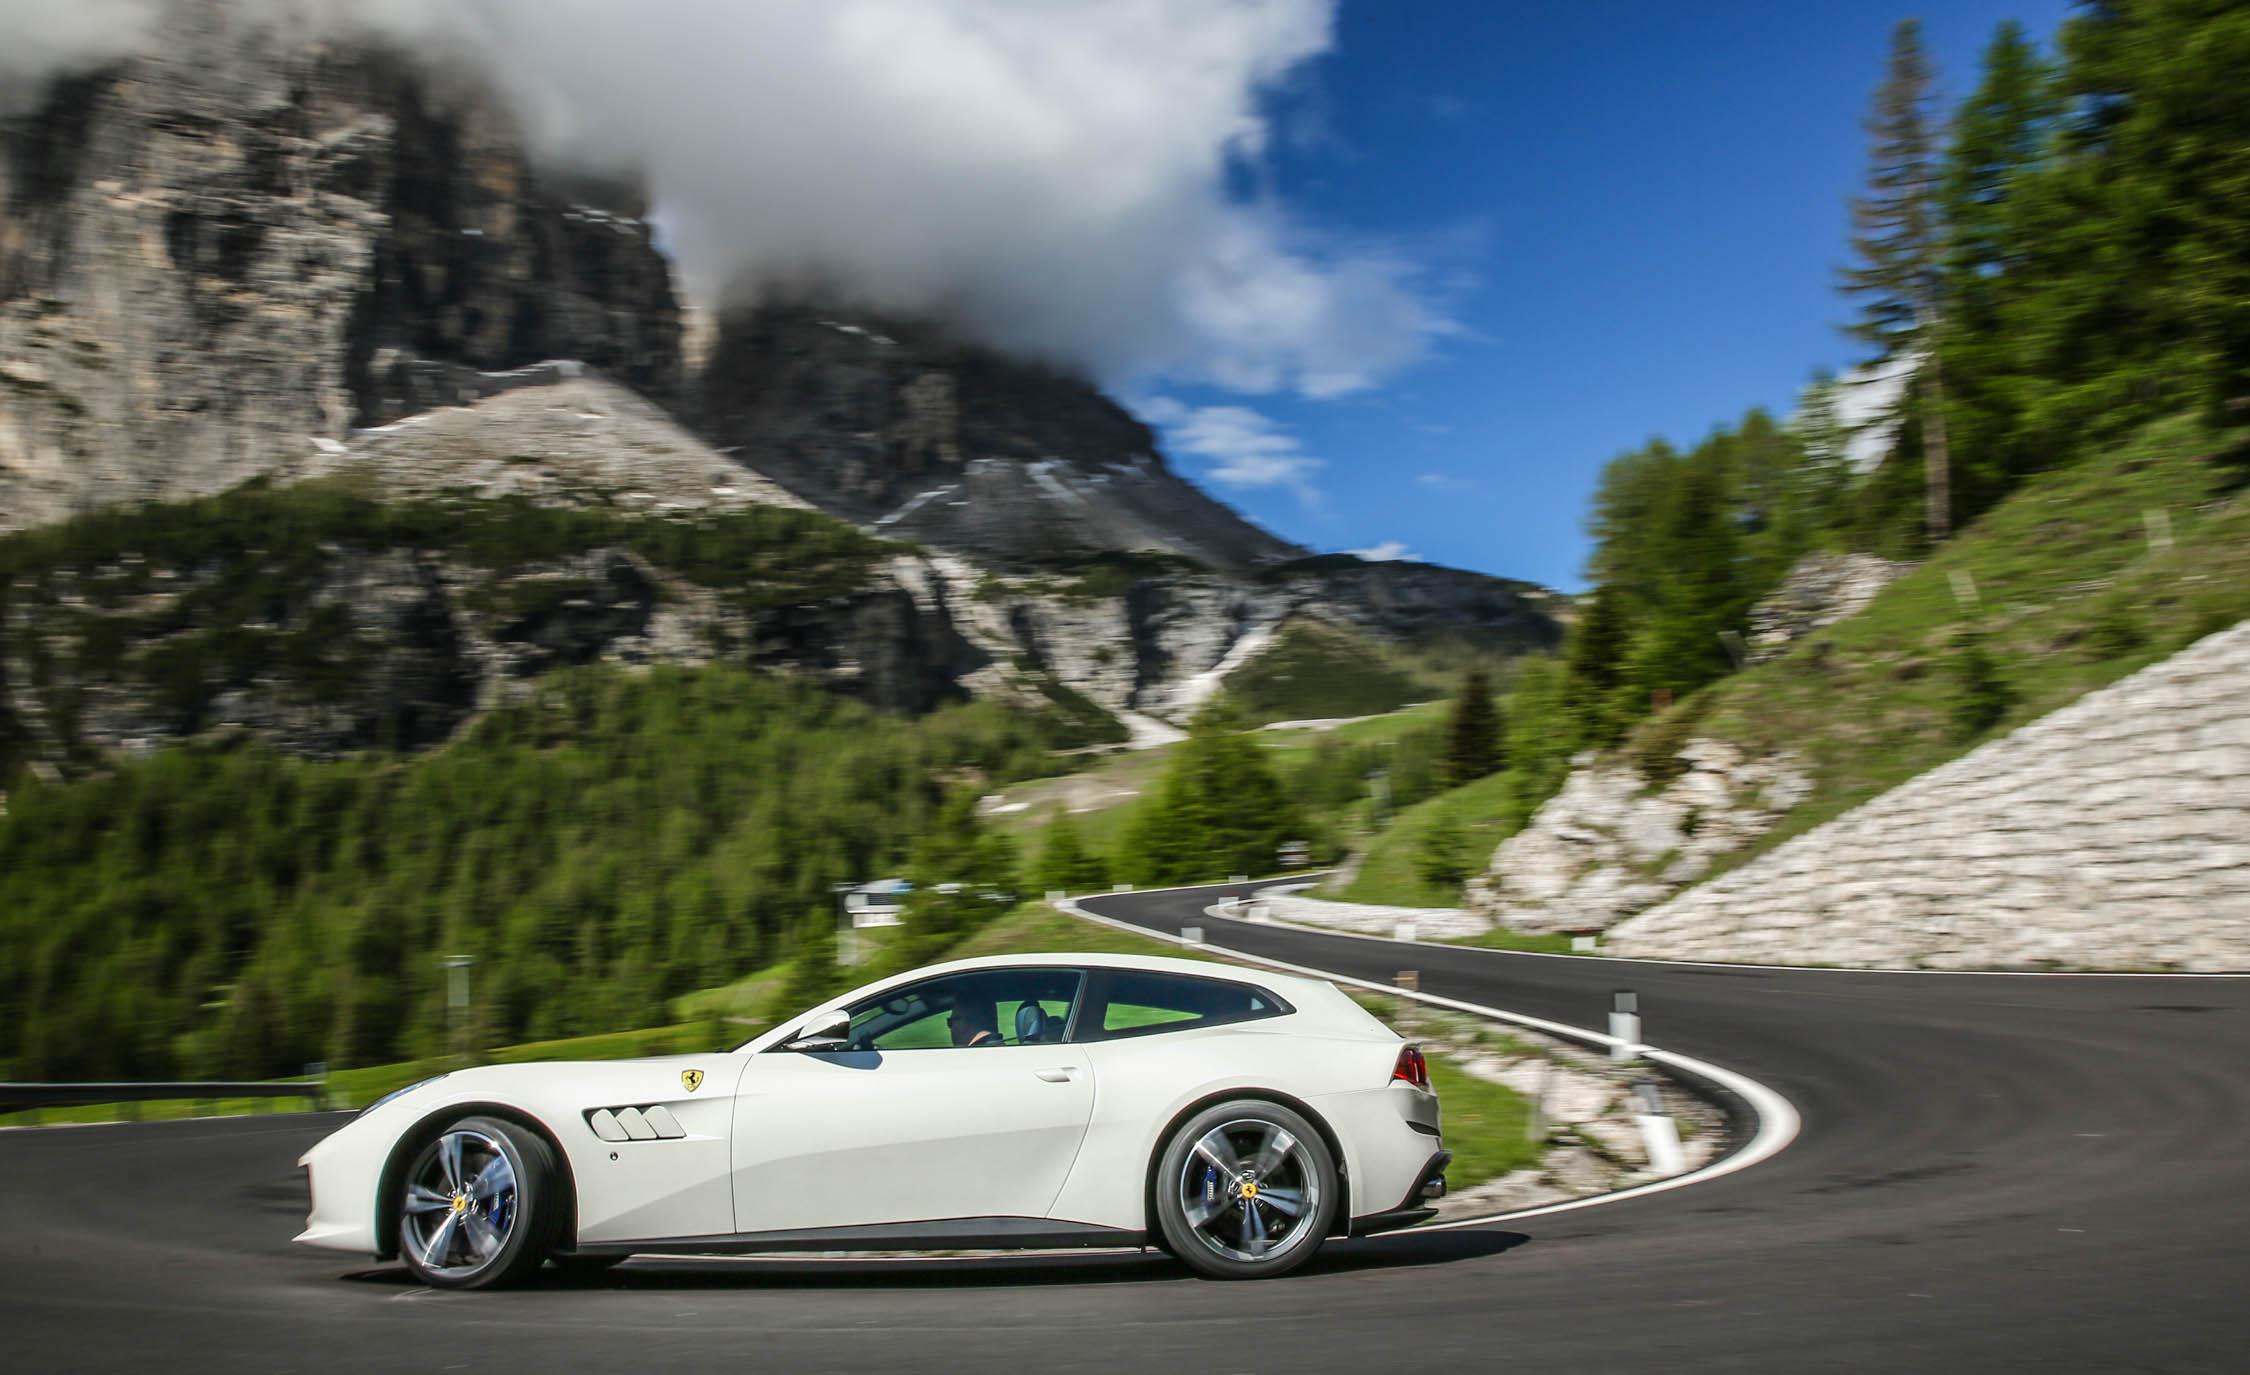 2017 Ferrari GTC4Lusso (View 18 of 52)